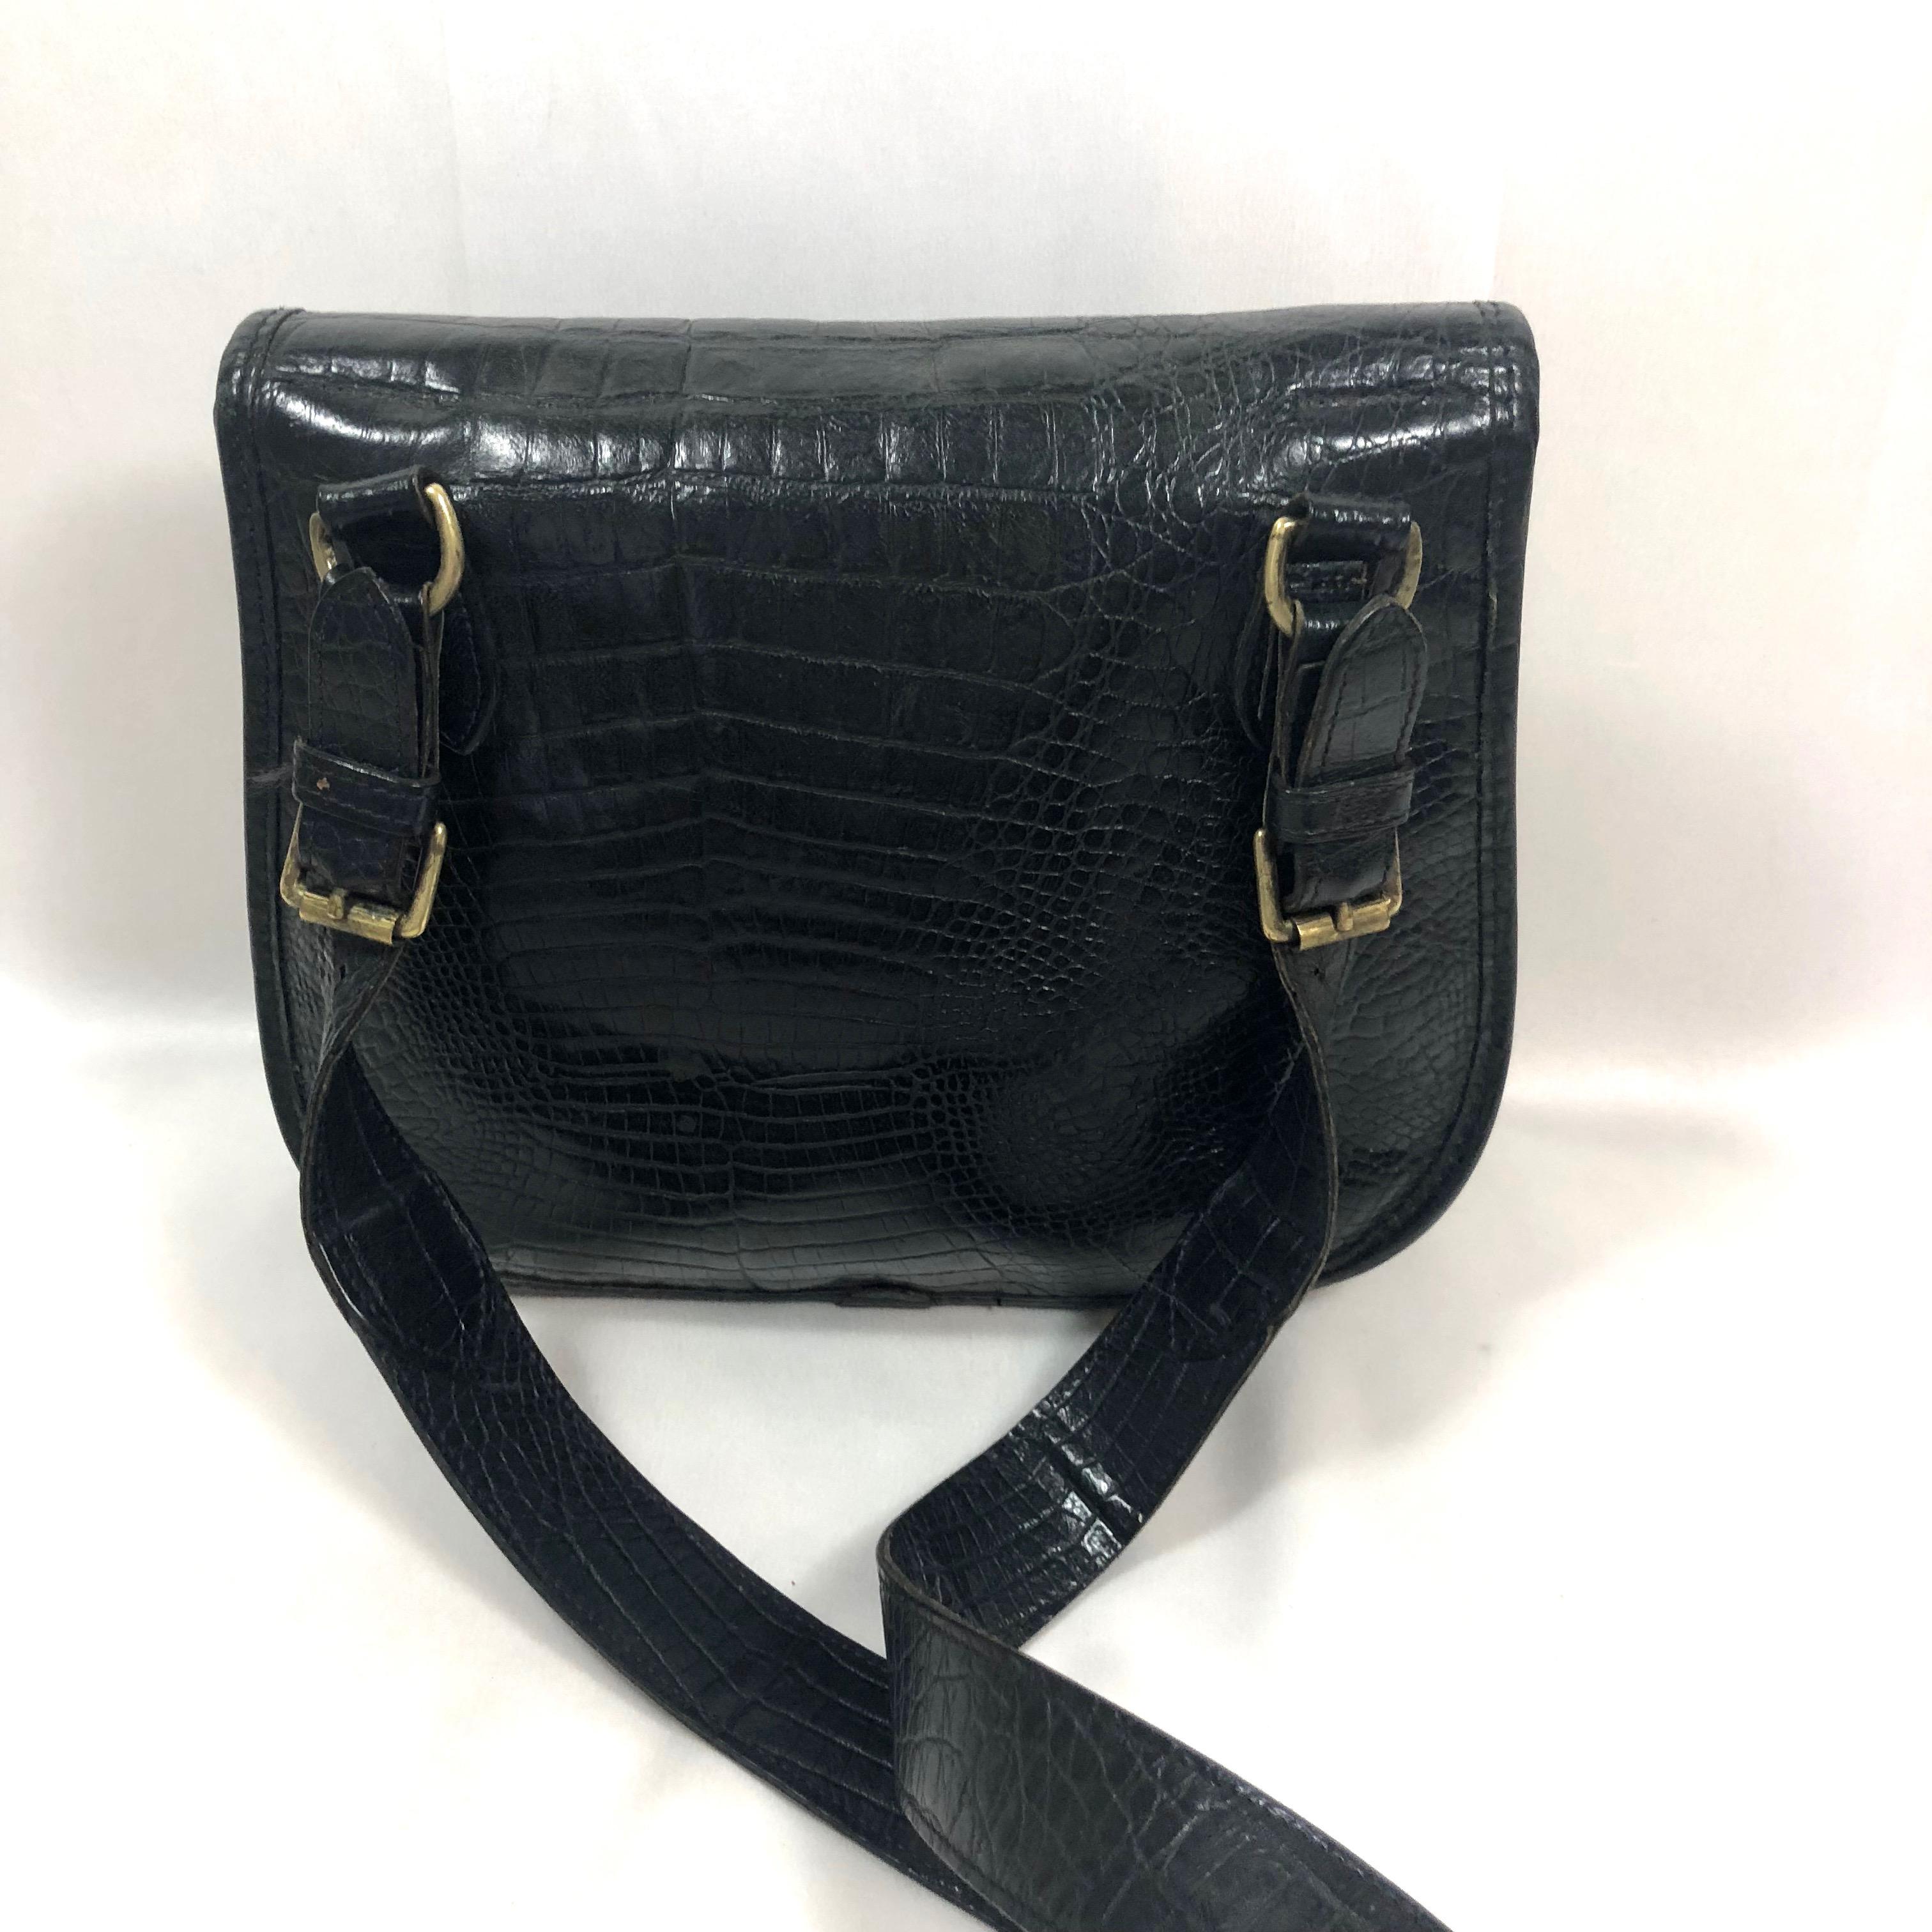 94355e9dfeb7 ... france mulberry vintage embossed leather crossbody bag 55b23 7898c